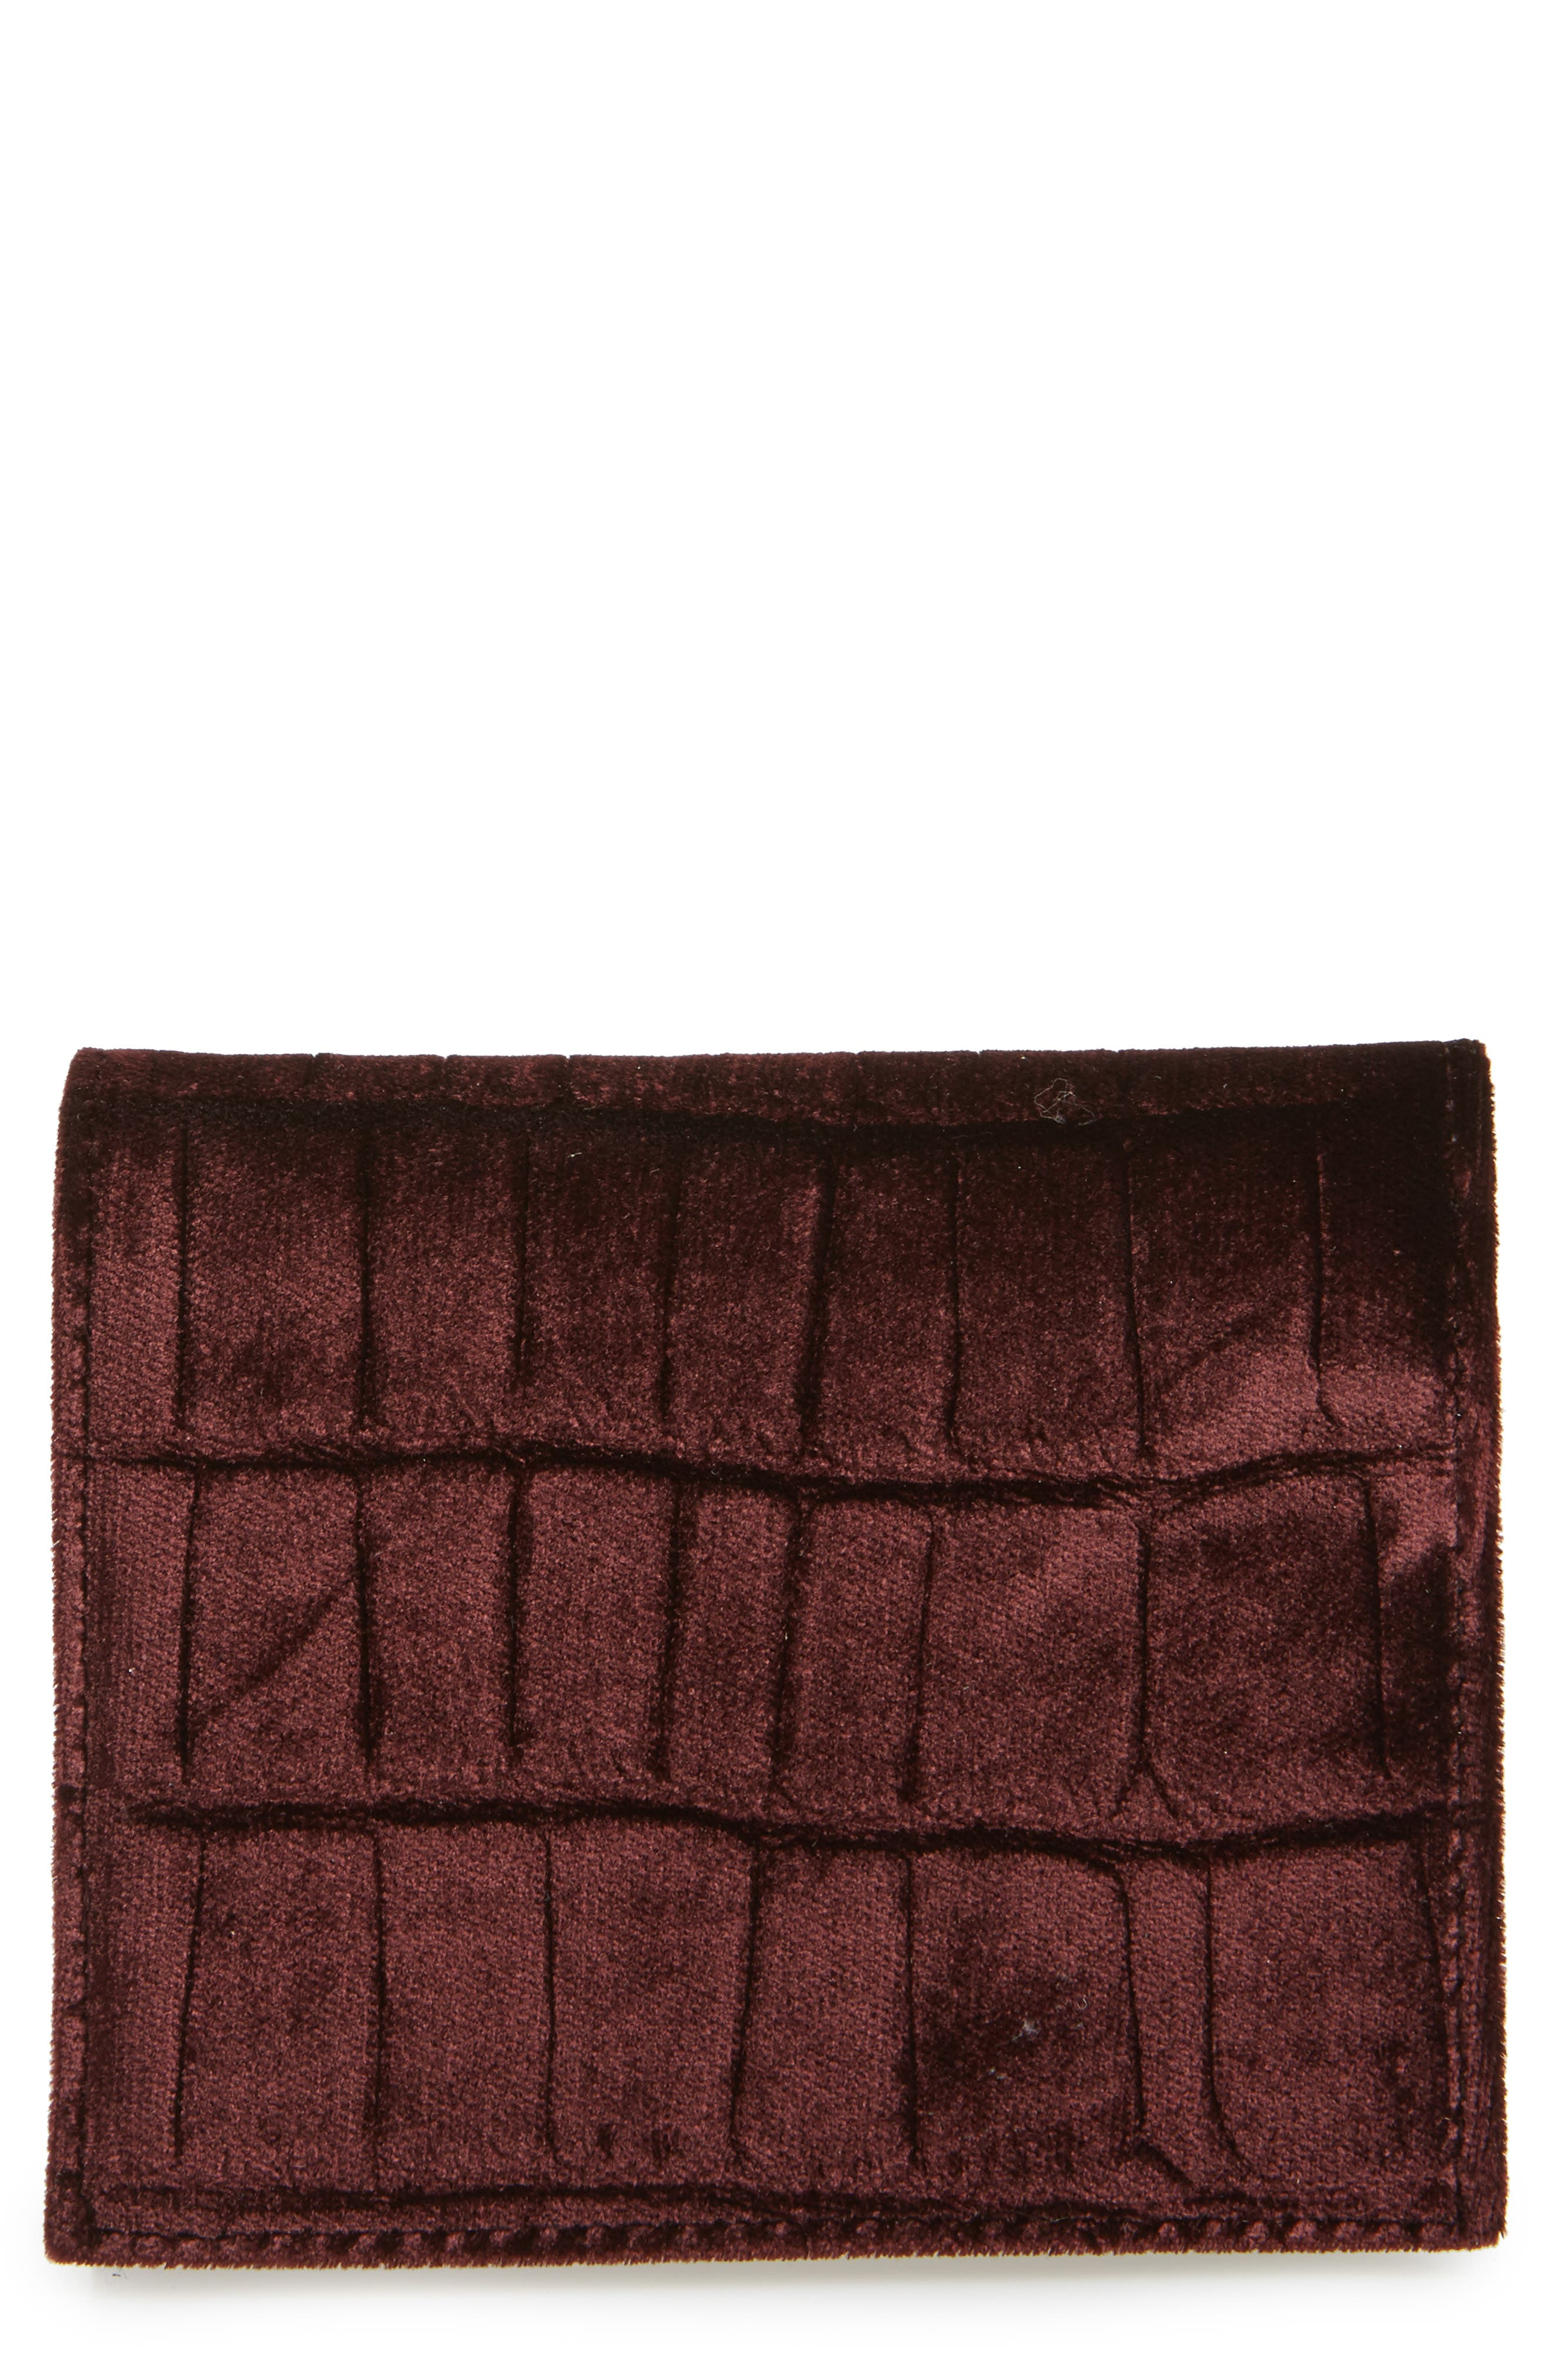 Main Image - ALLSAINTS Small Keel Croc Embossed Velvet Wallet